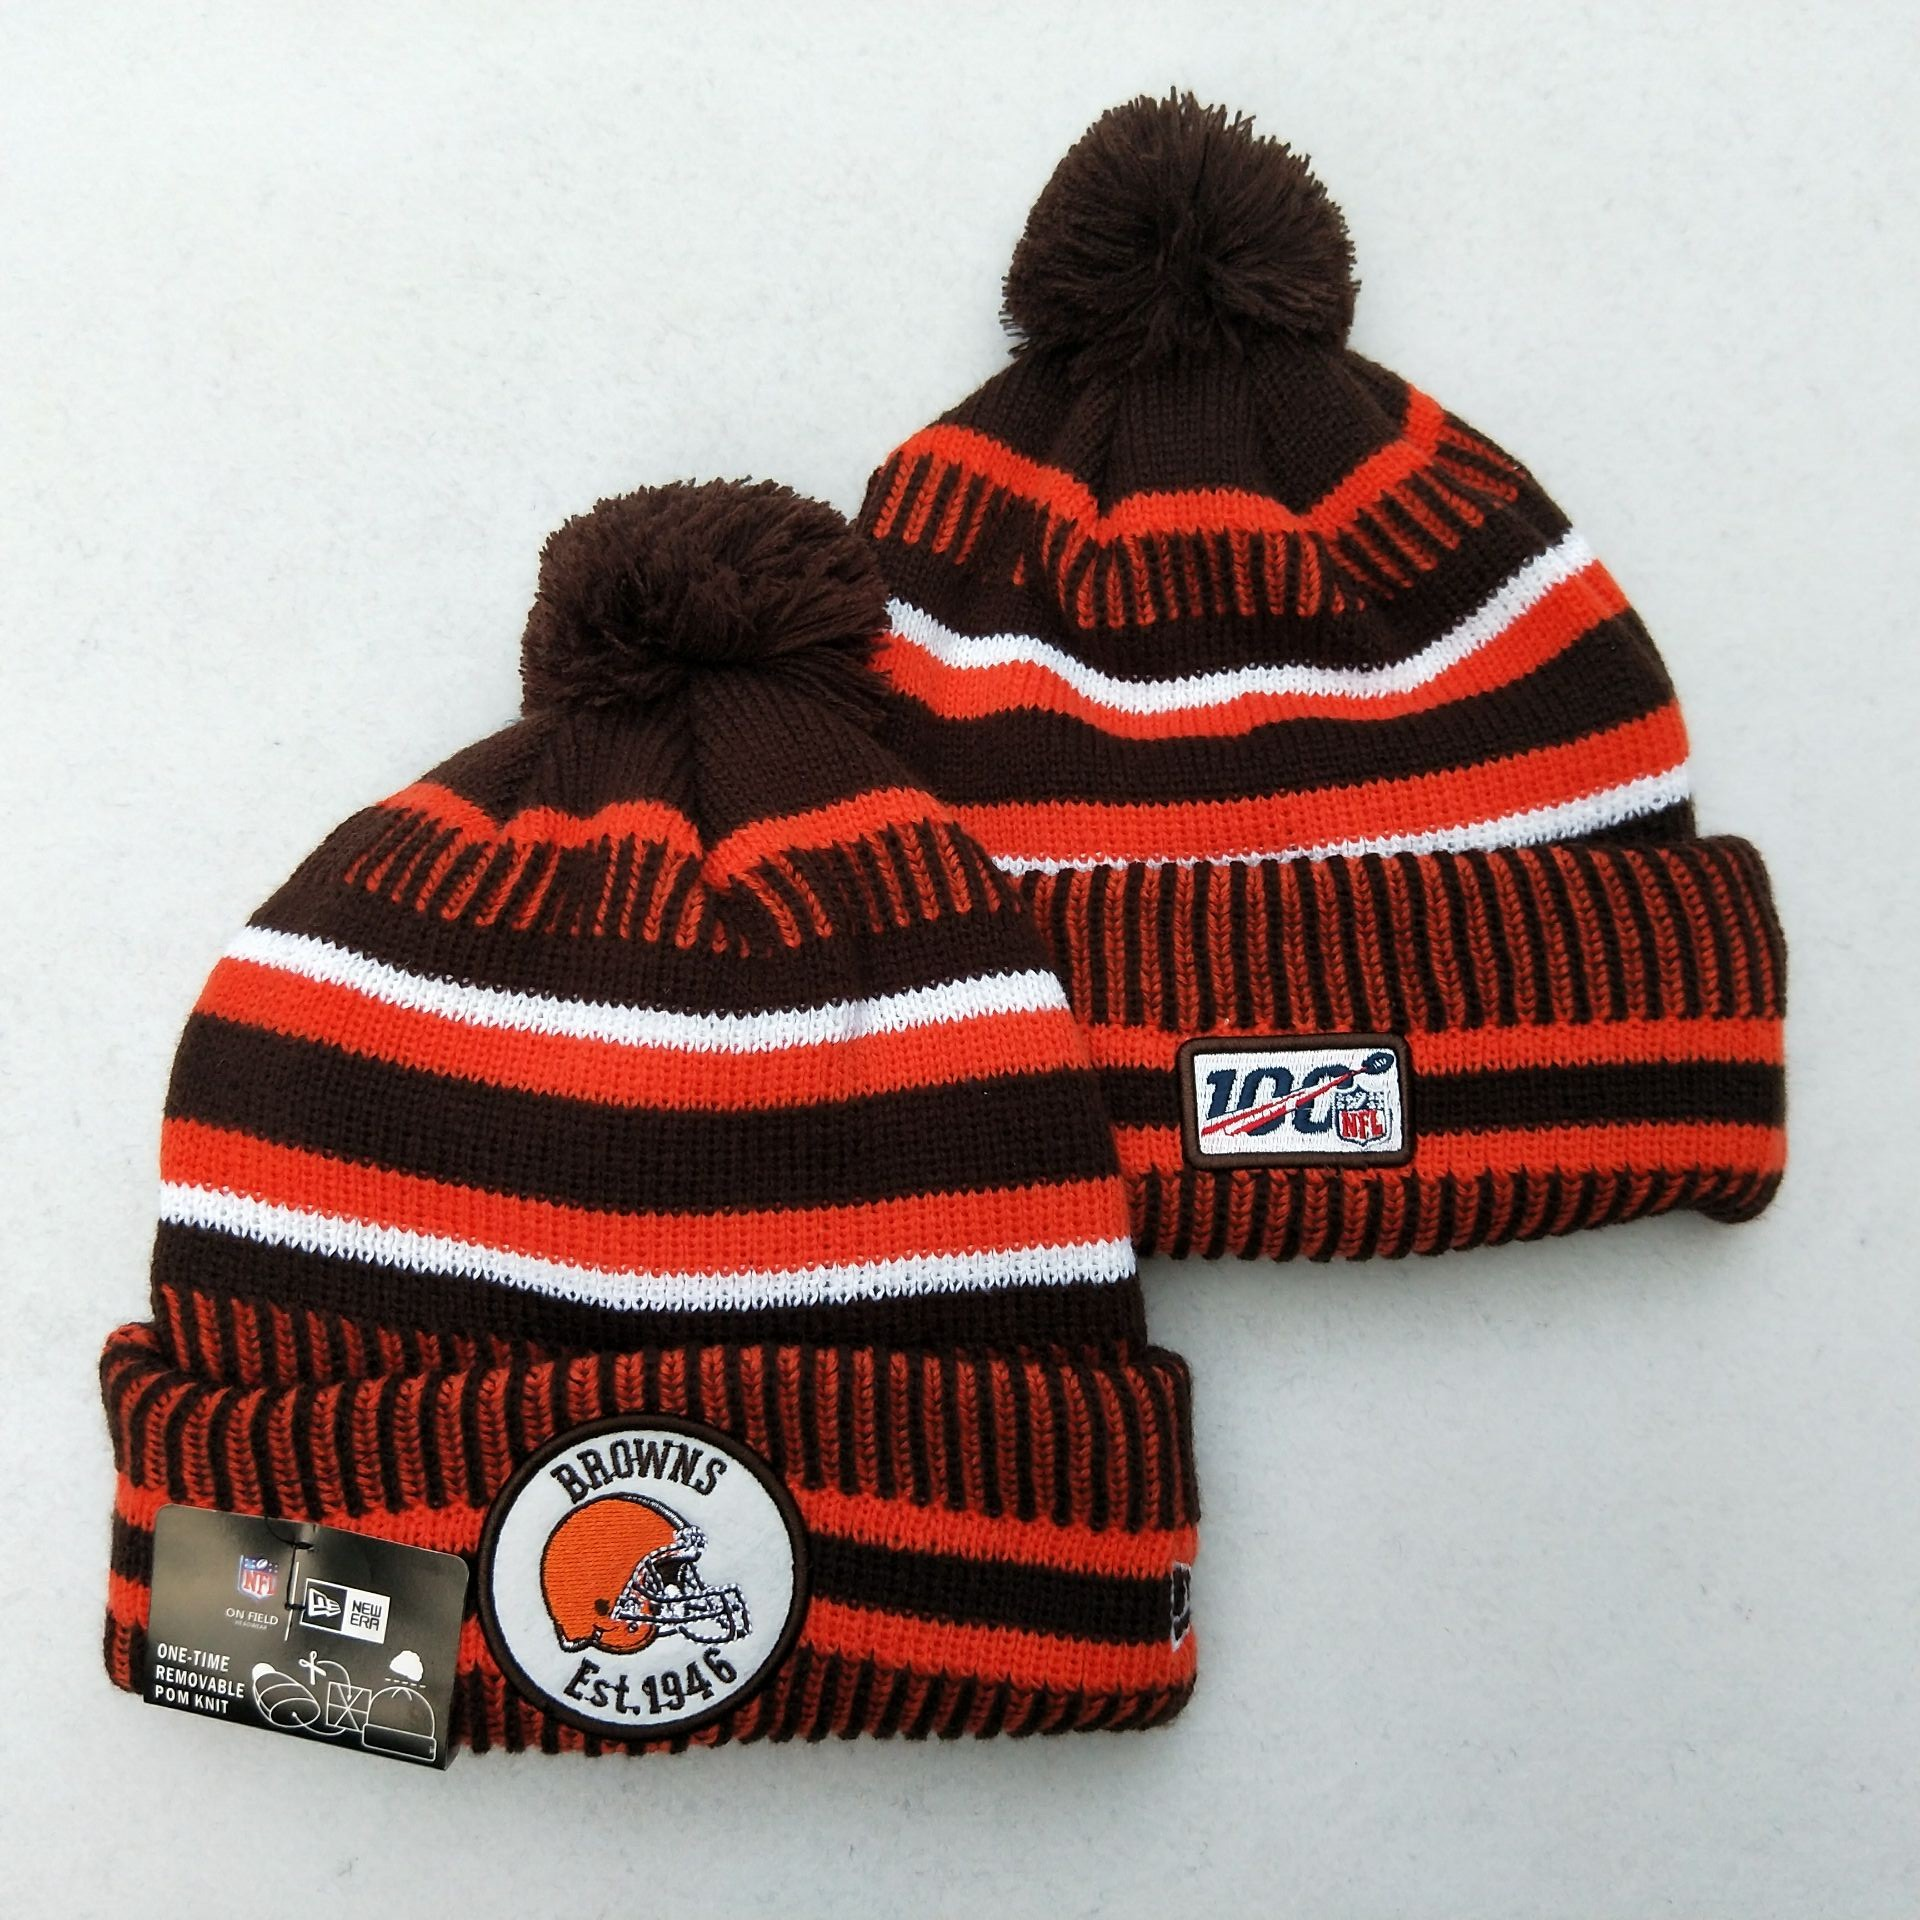 Browns Team Logo Brown 100th Season Pom Knit Hat YD